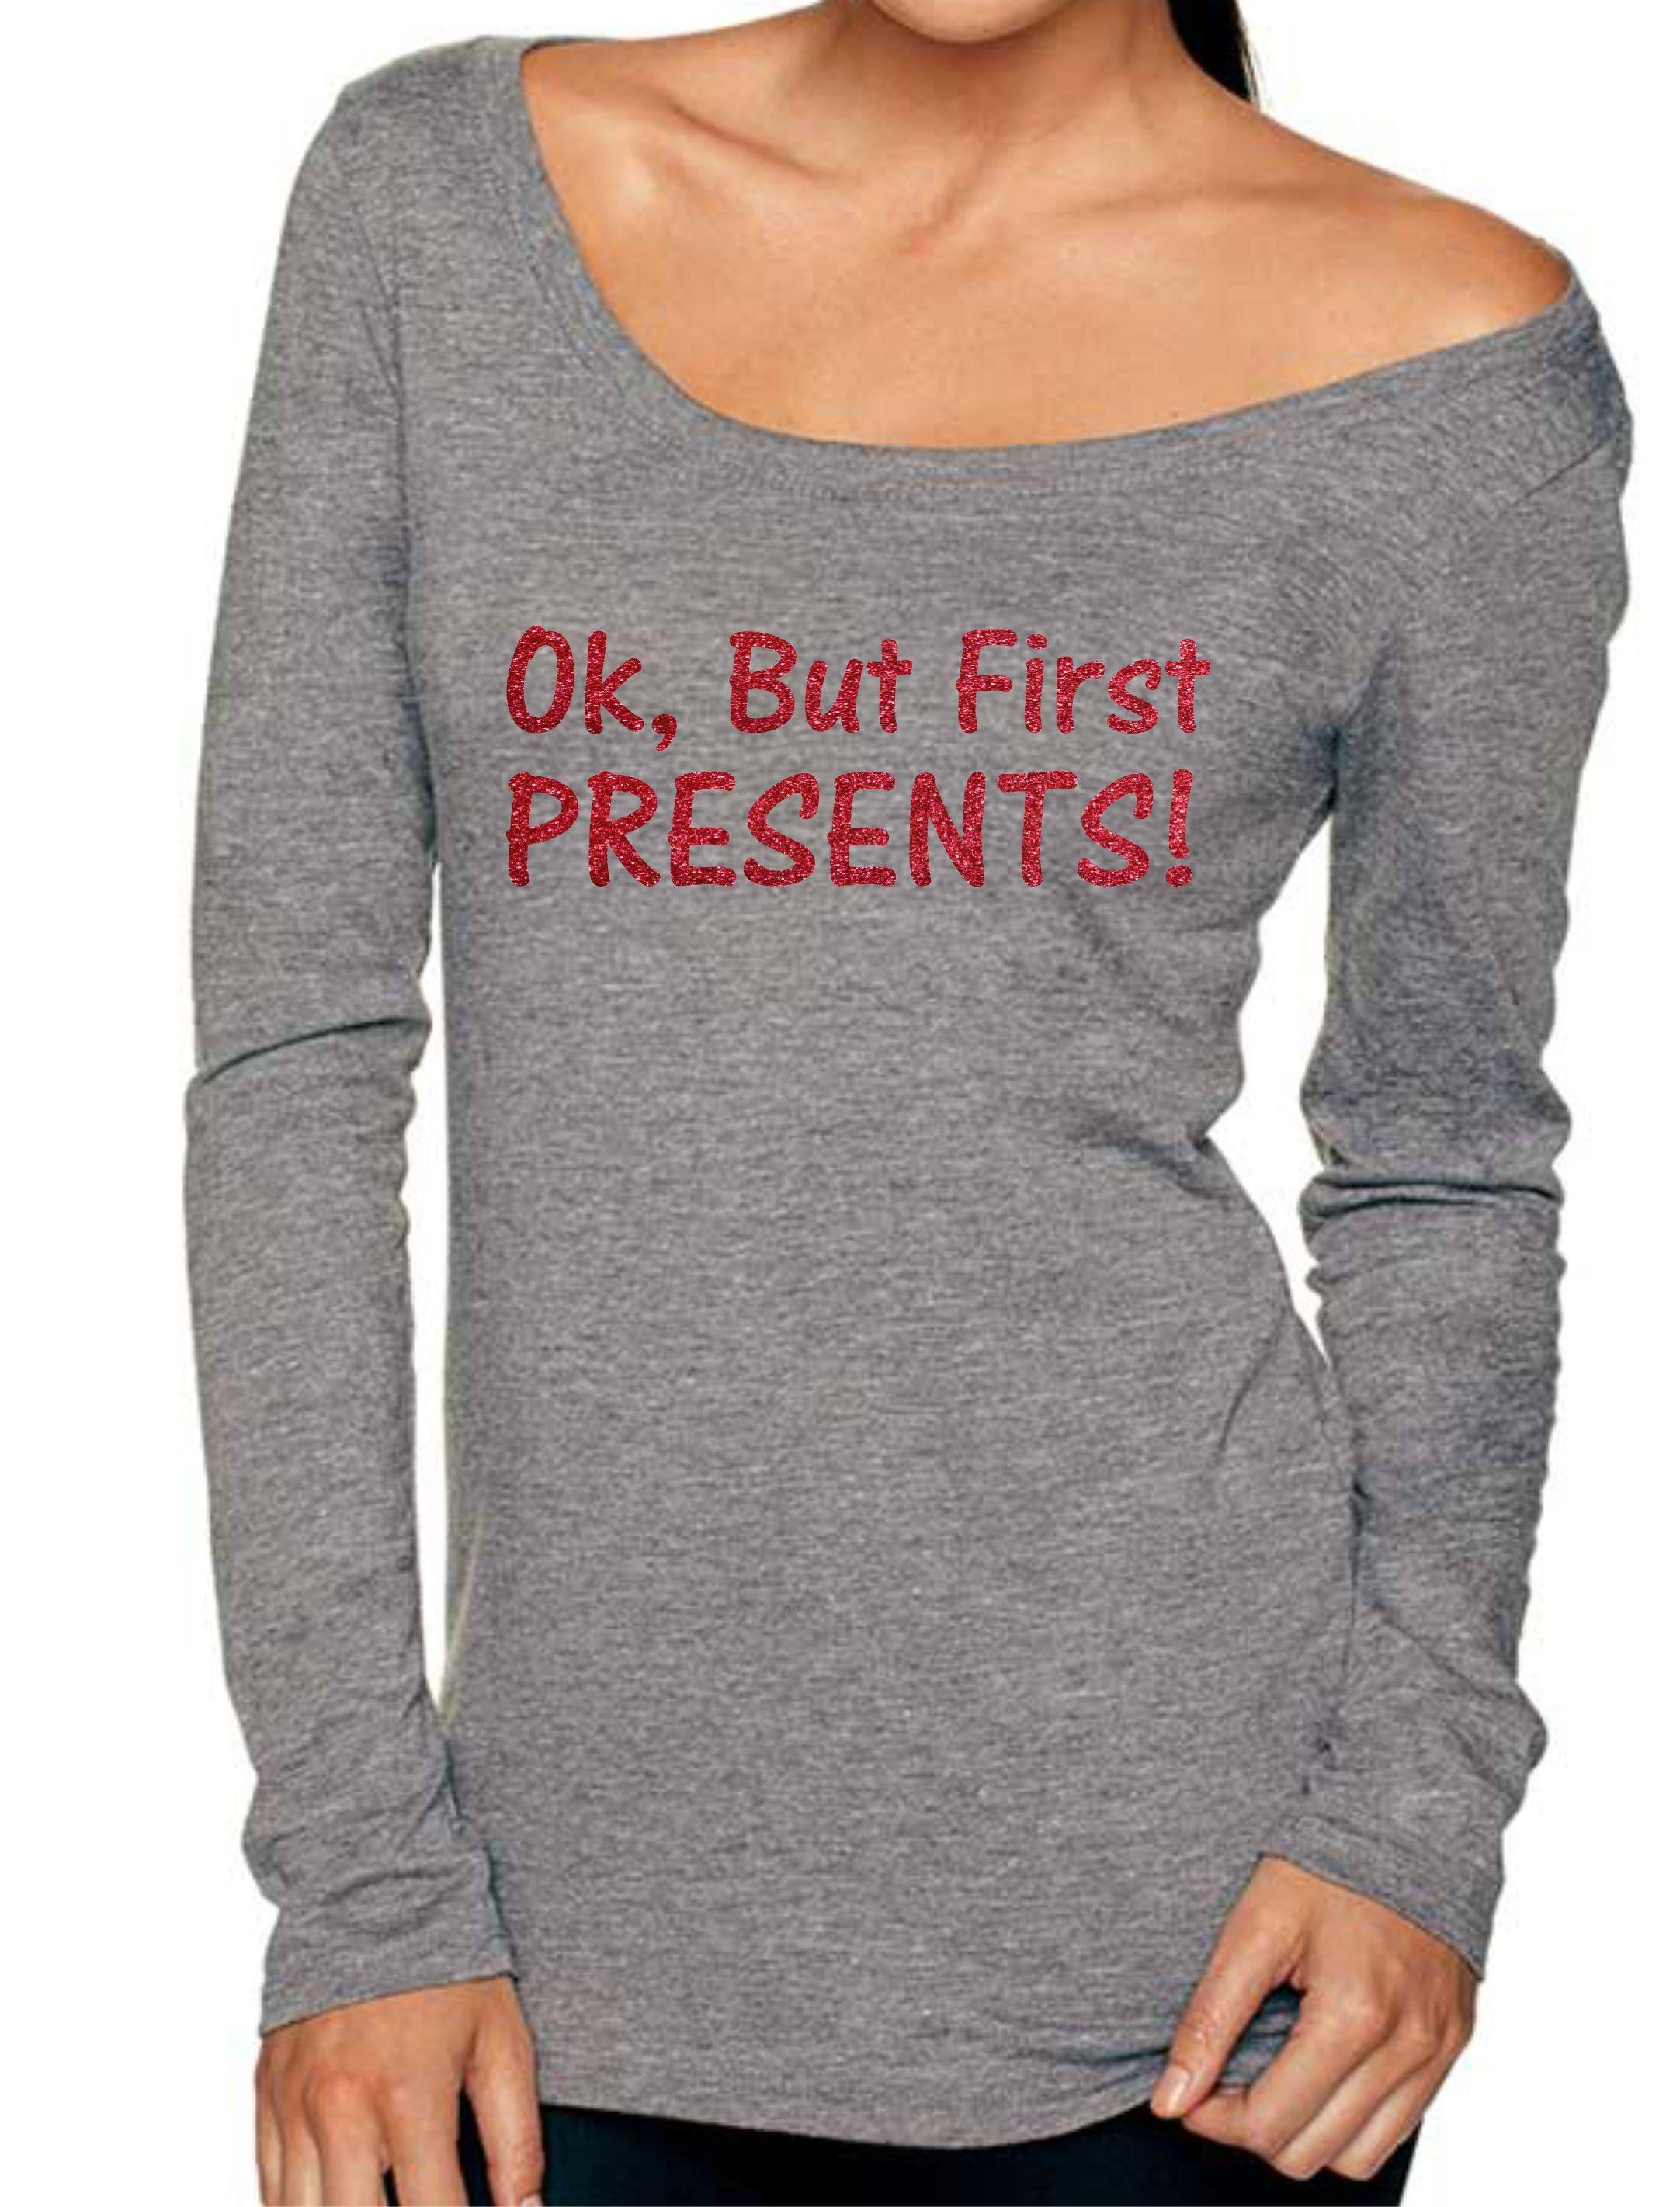 christmas pjs ok but first presents shirt womens christmas tee ladies holiday shirts xmas shirt slouch christmas top grey red